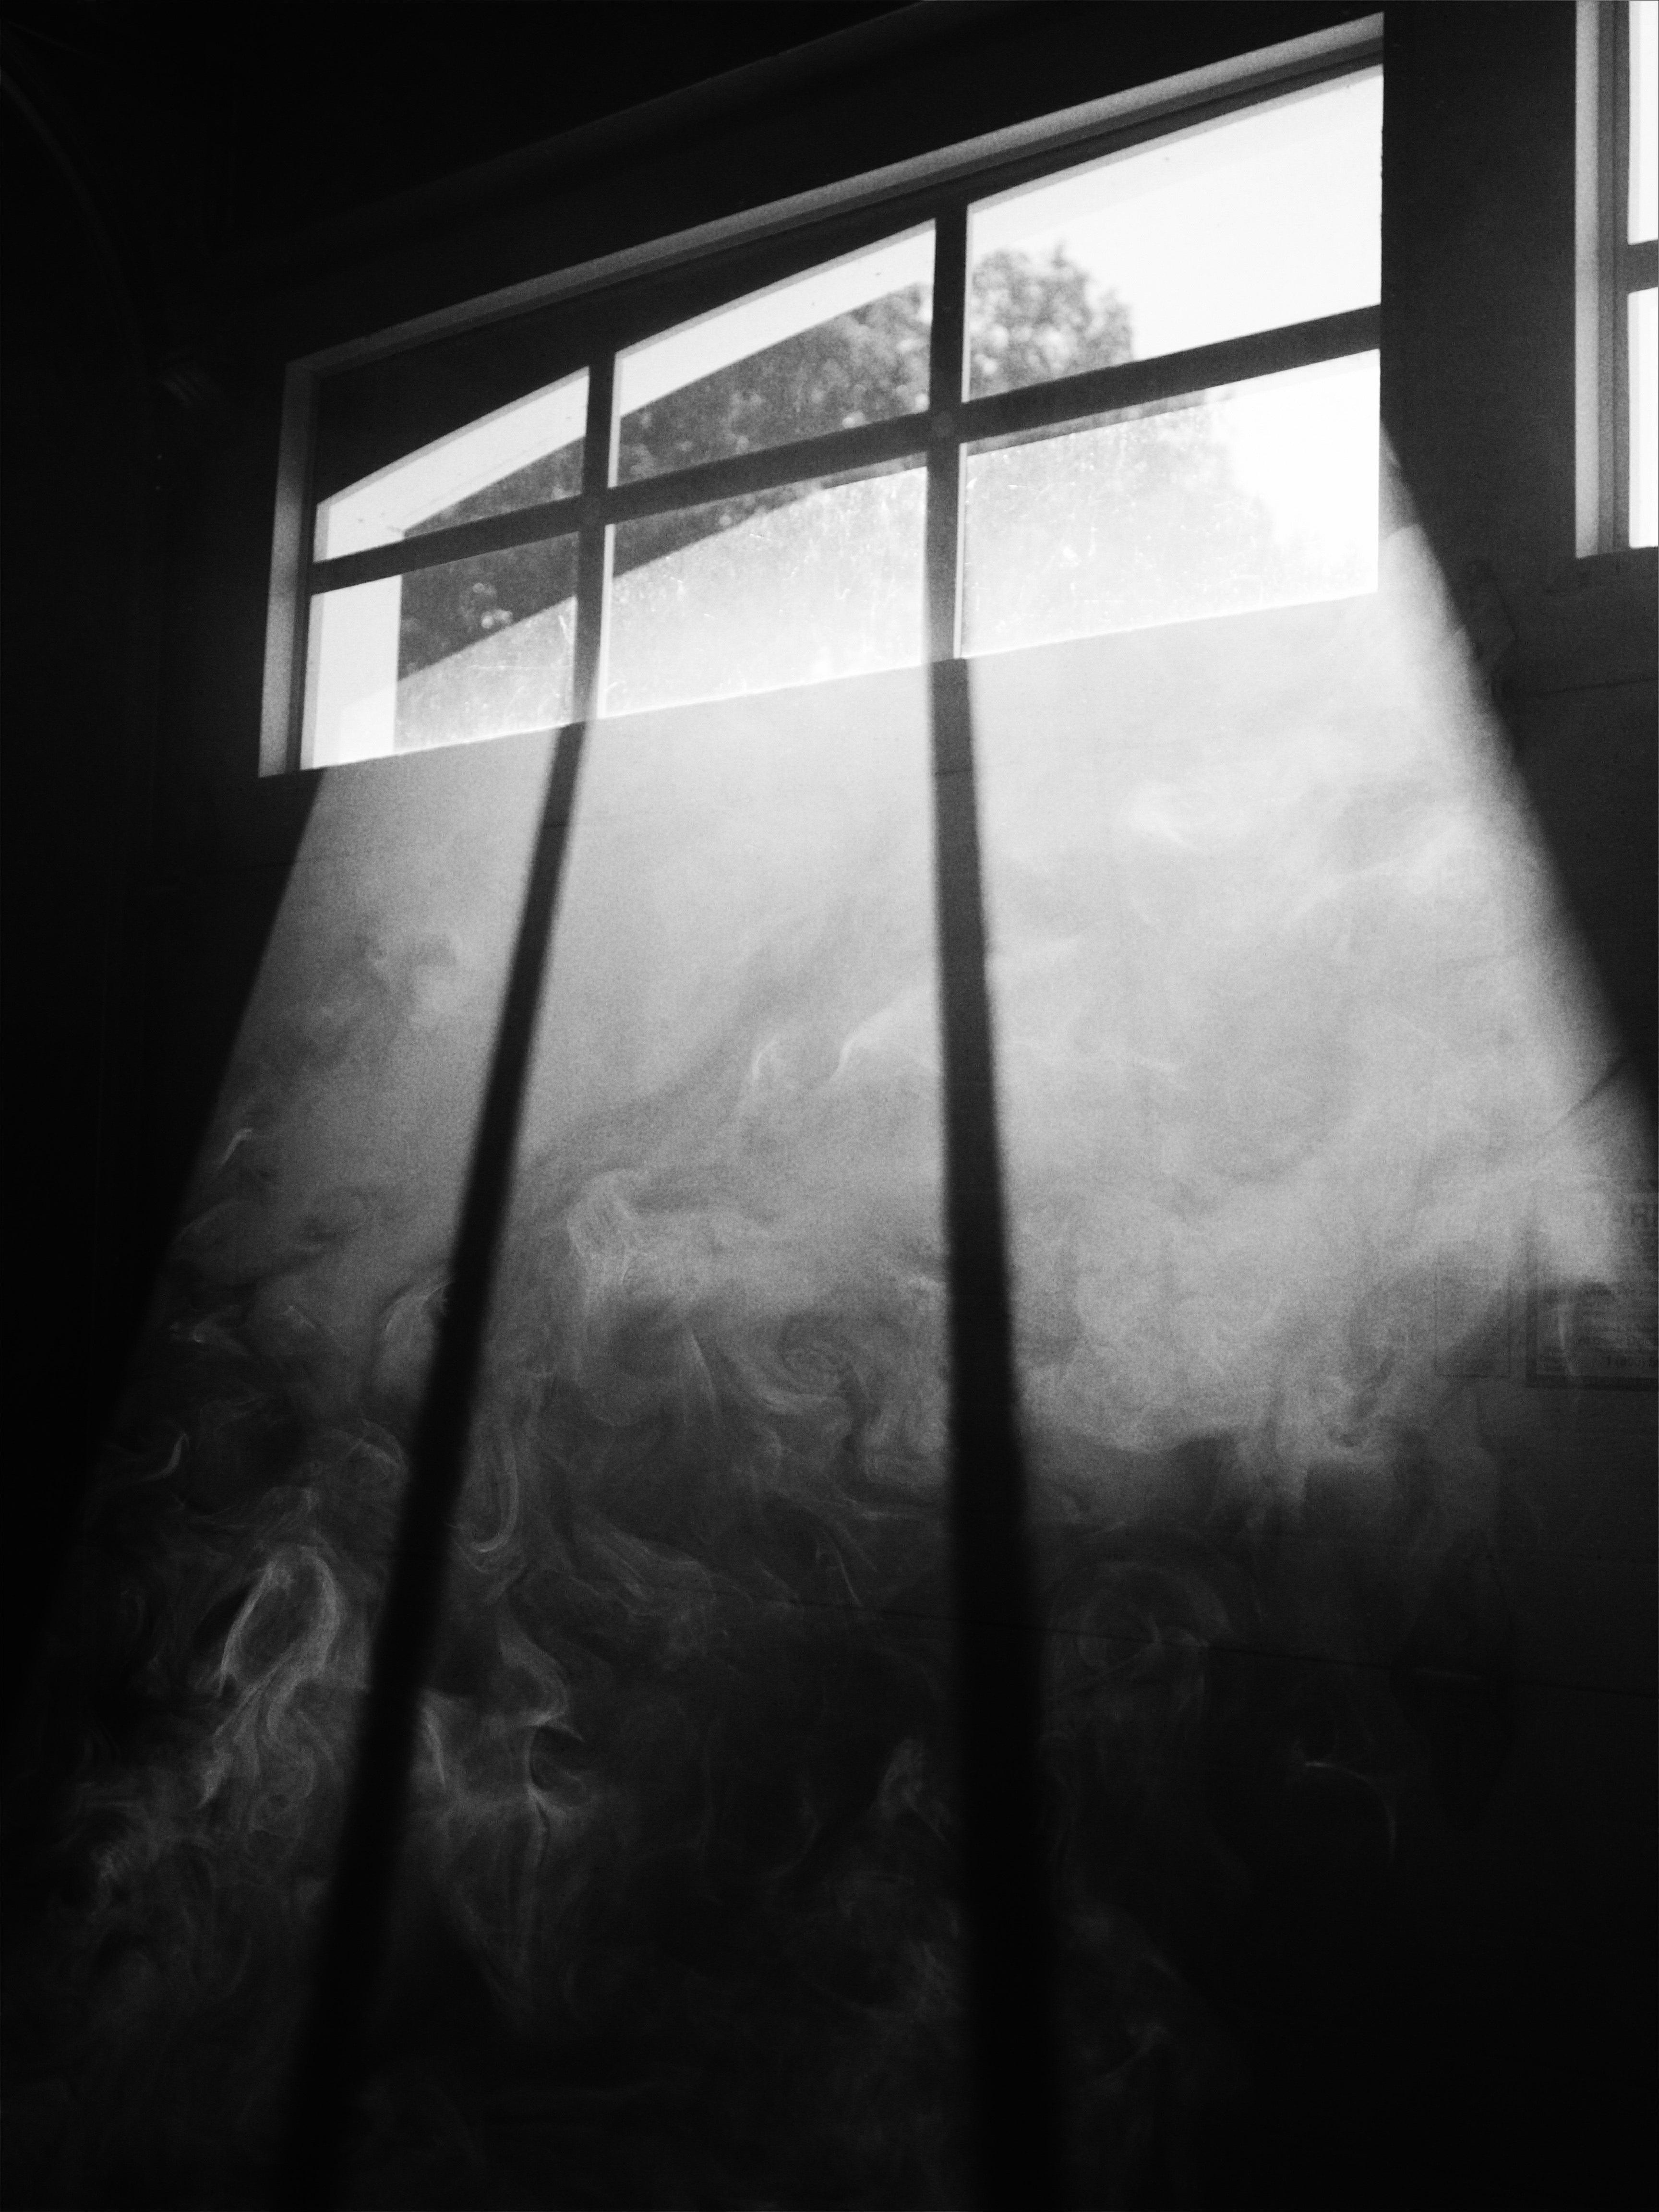 garage window taylor-young-183282.jpg